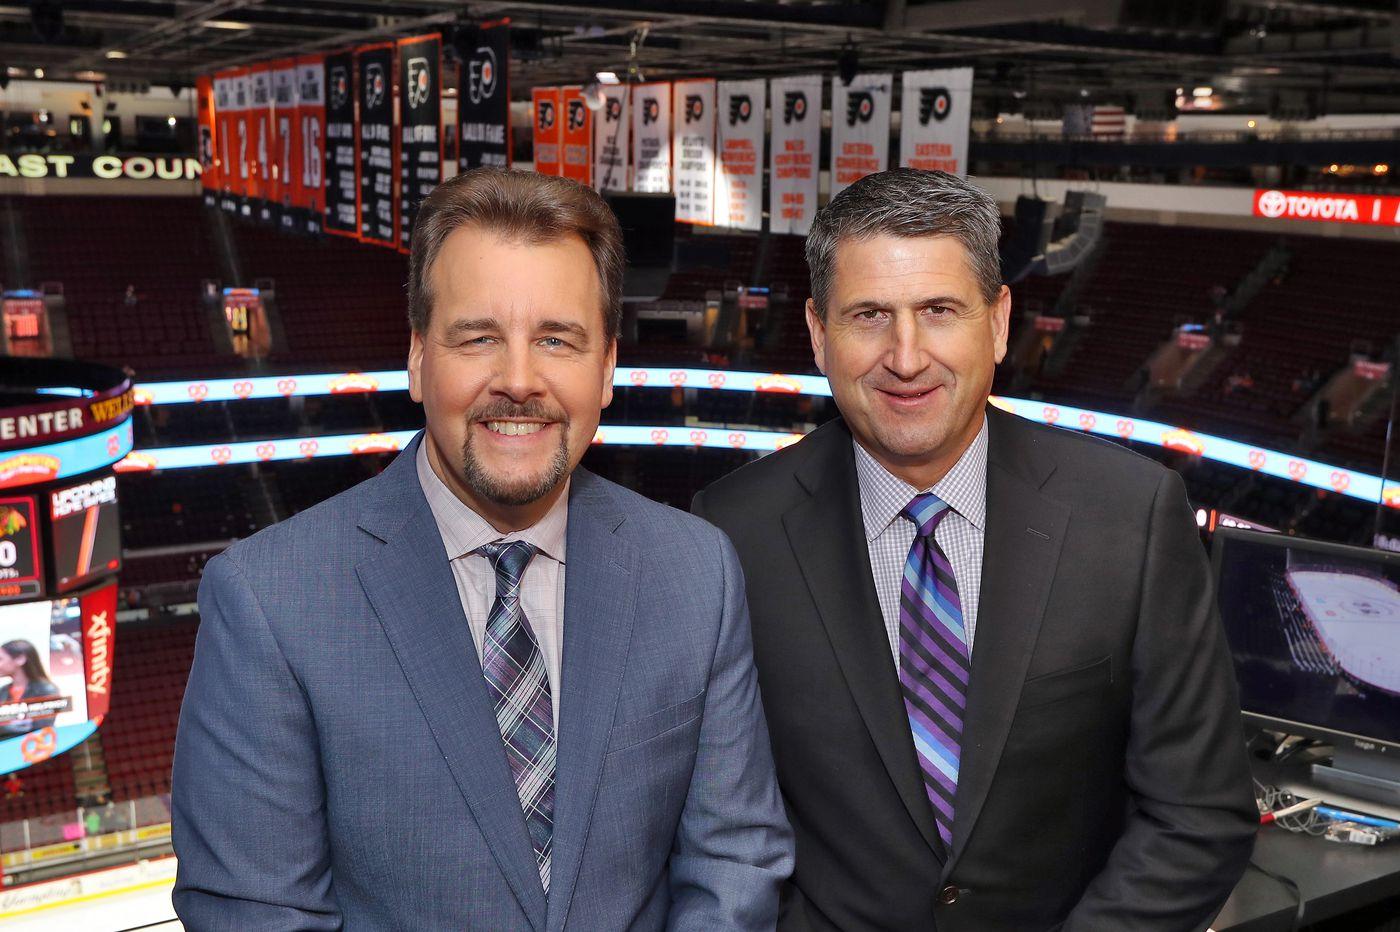 Phillies radio broadcaster Jim Jackson announces he won't return next season